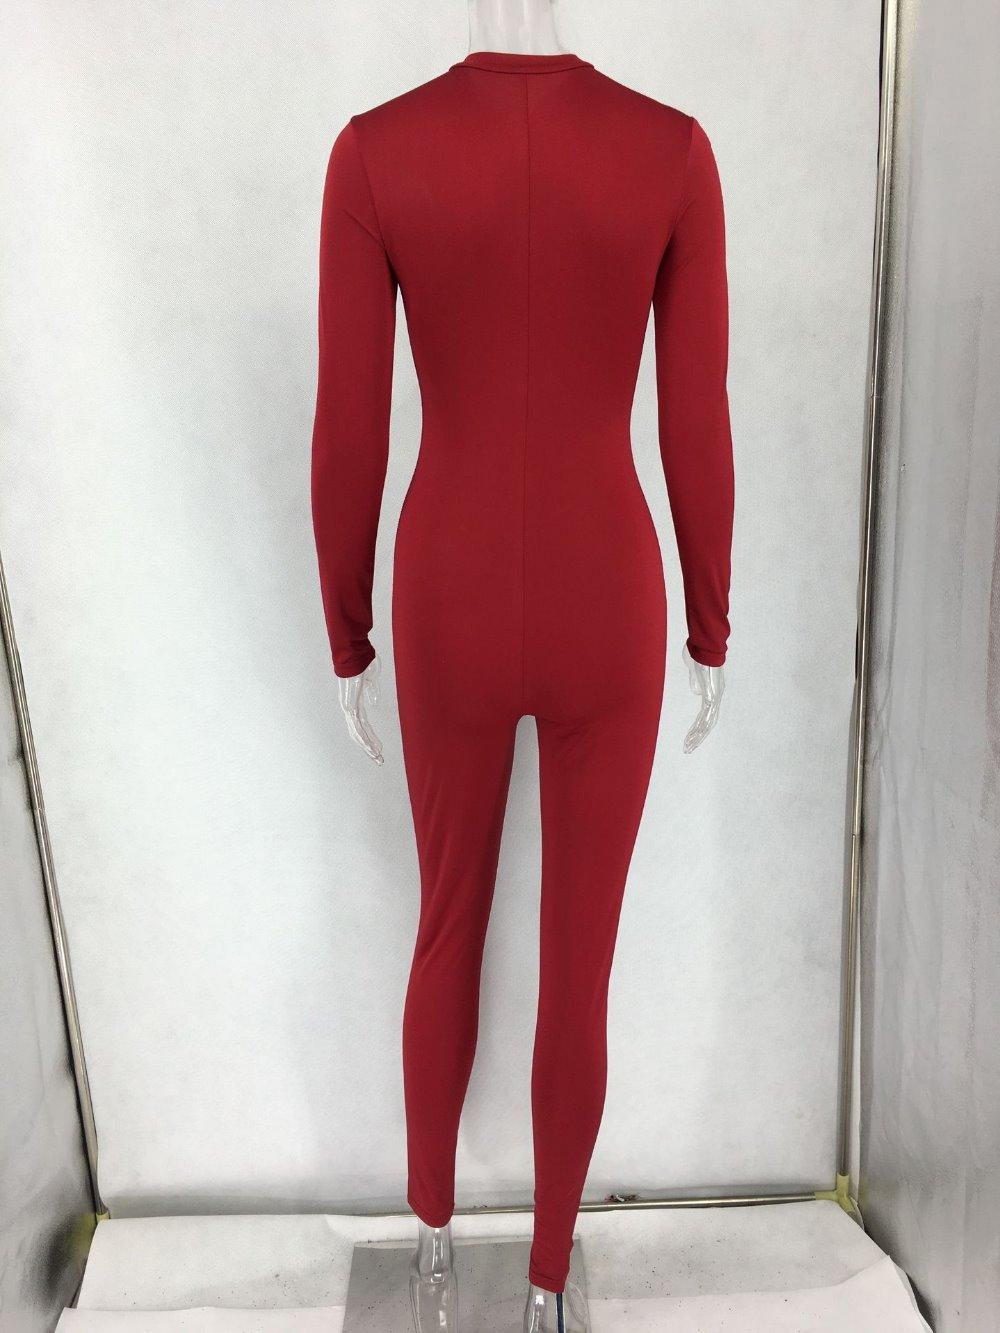 Club Size Jumpsuits Bodycon Big Wine Sexy Women Fashion V Celebrity Red Sleeve Night Jumpsuit neck Party Long zaw6xq5YZ